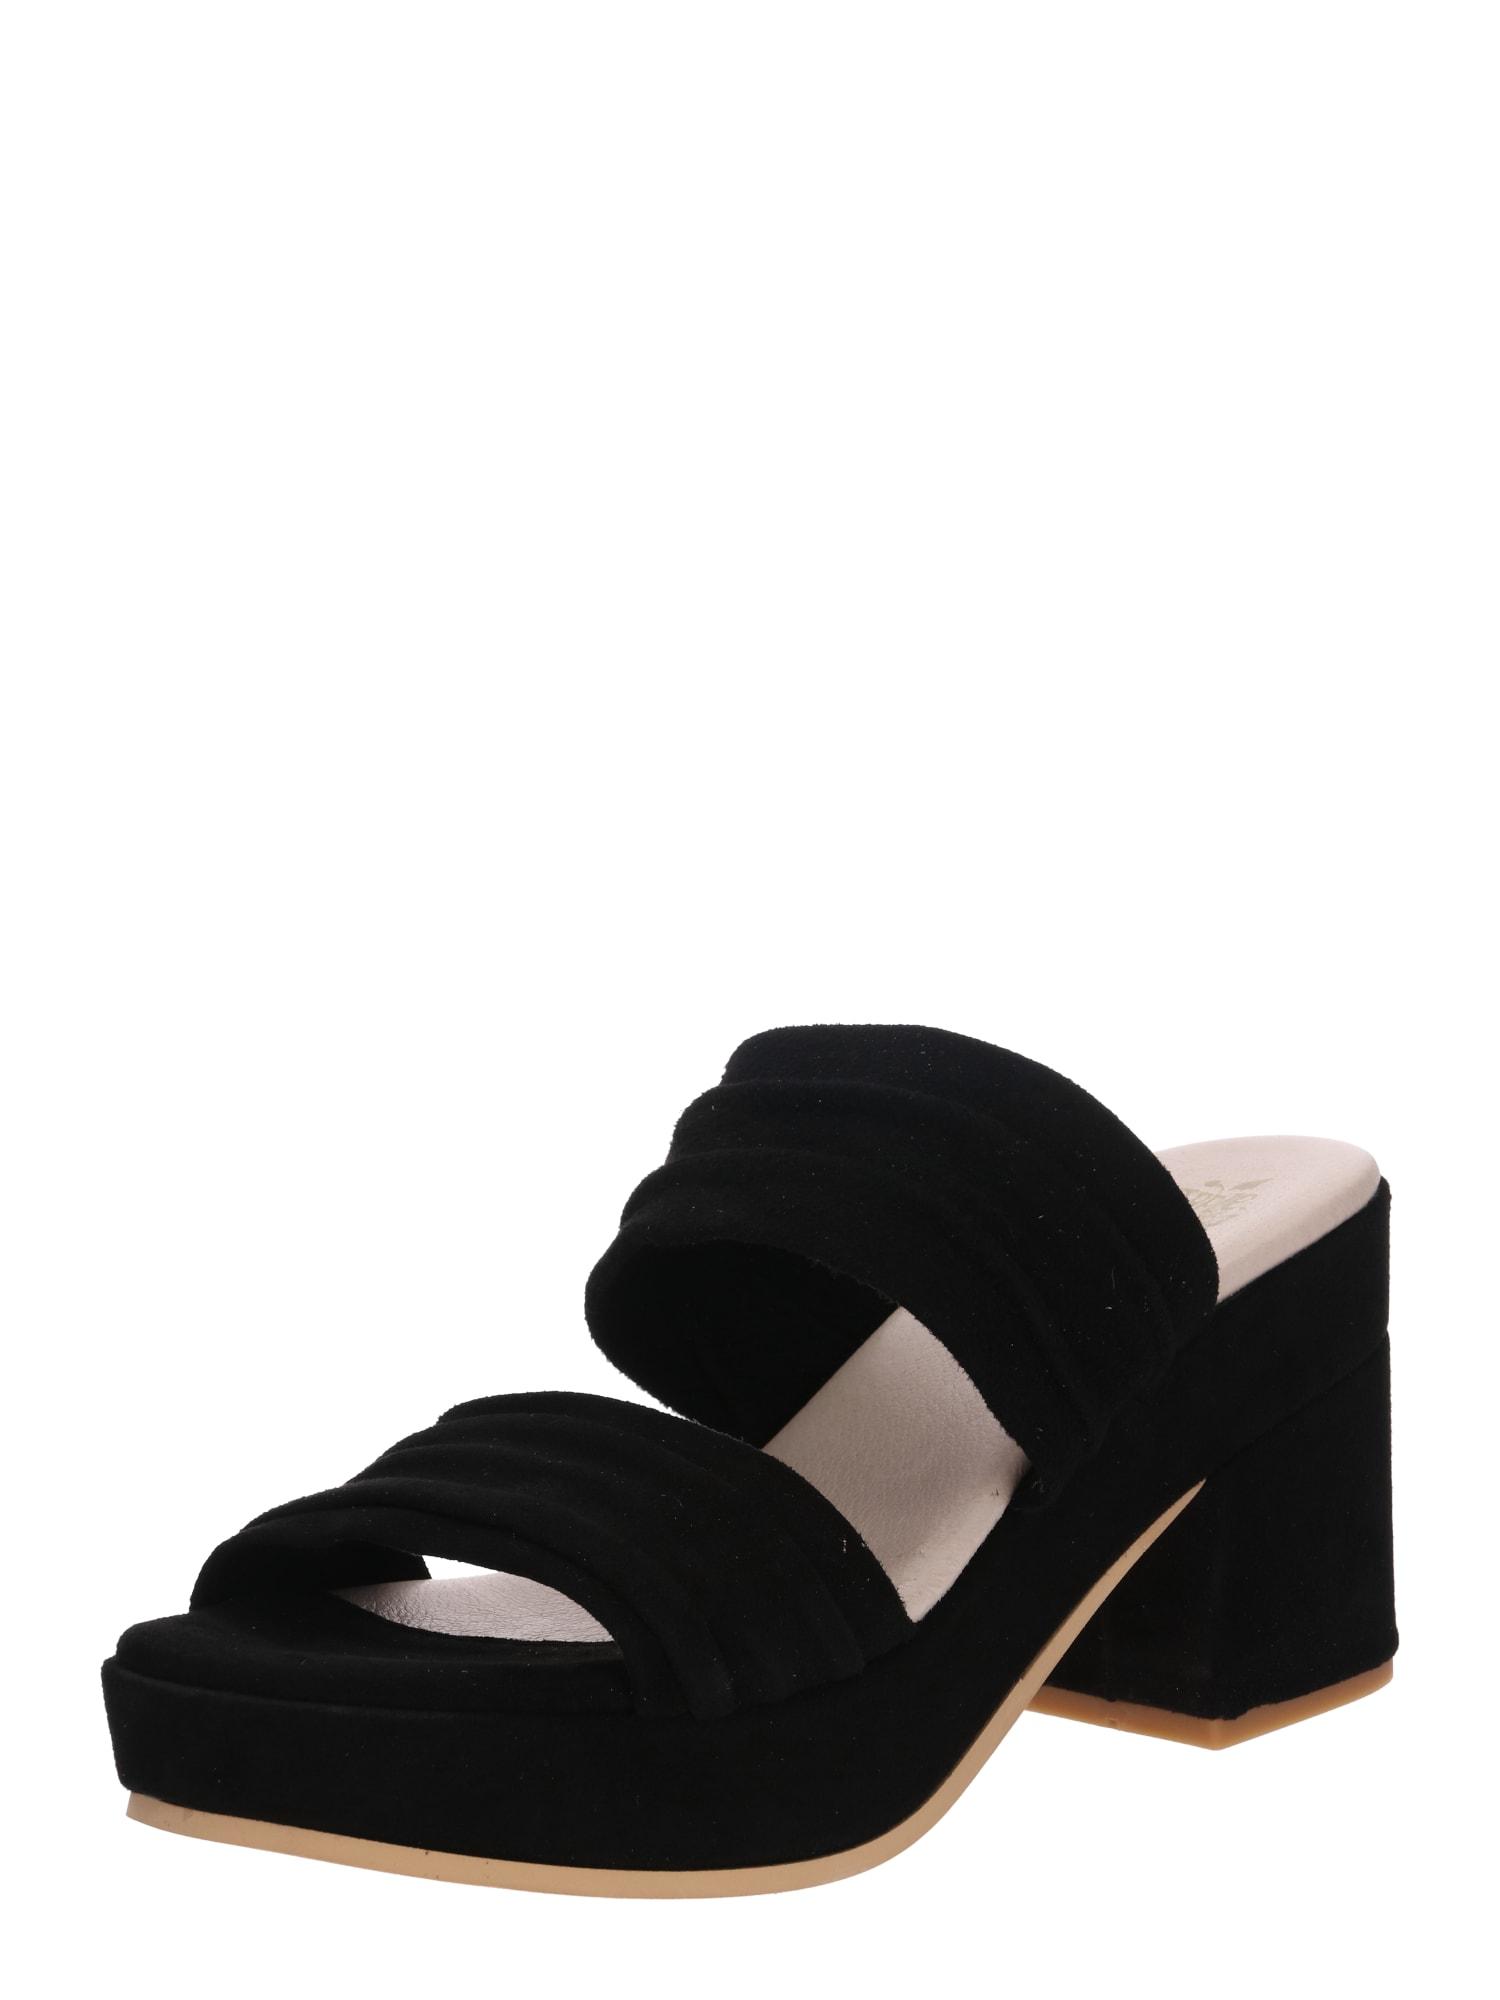 Sandály Blanca černá Apple Of Eden